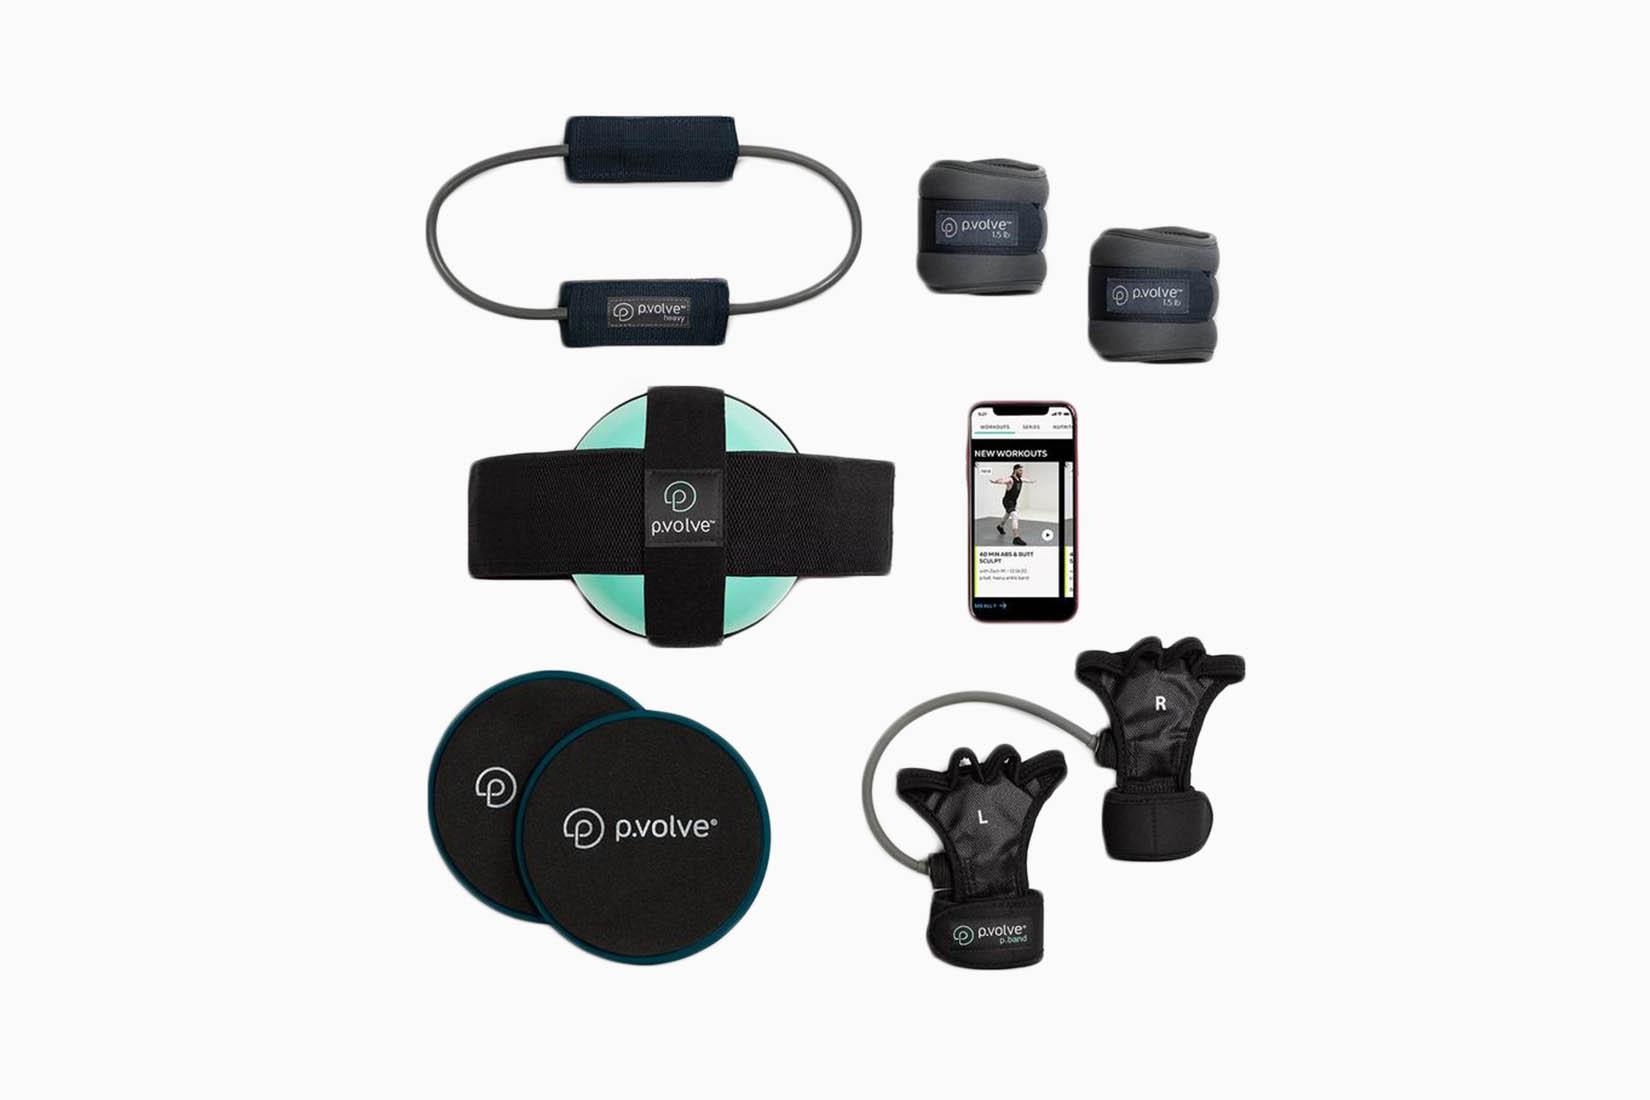 best home gym equipment p volve starter kitreview - luxe digital